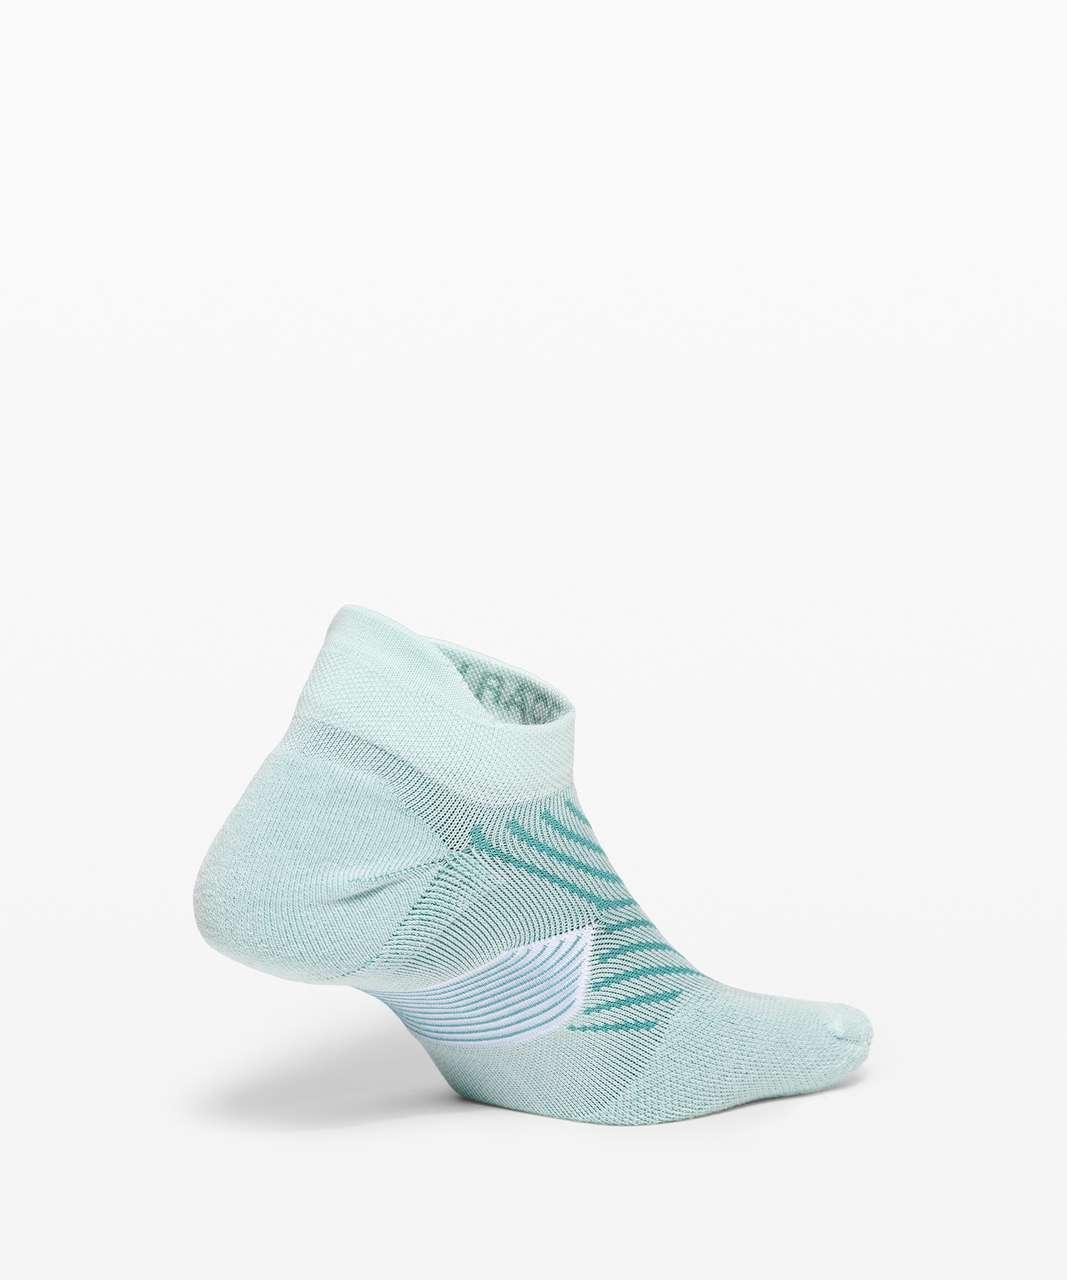 Lululemon Speed Sock *Silver - Rip Tide / Aqua Glow / Aqua Aura